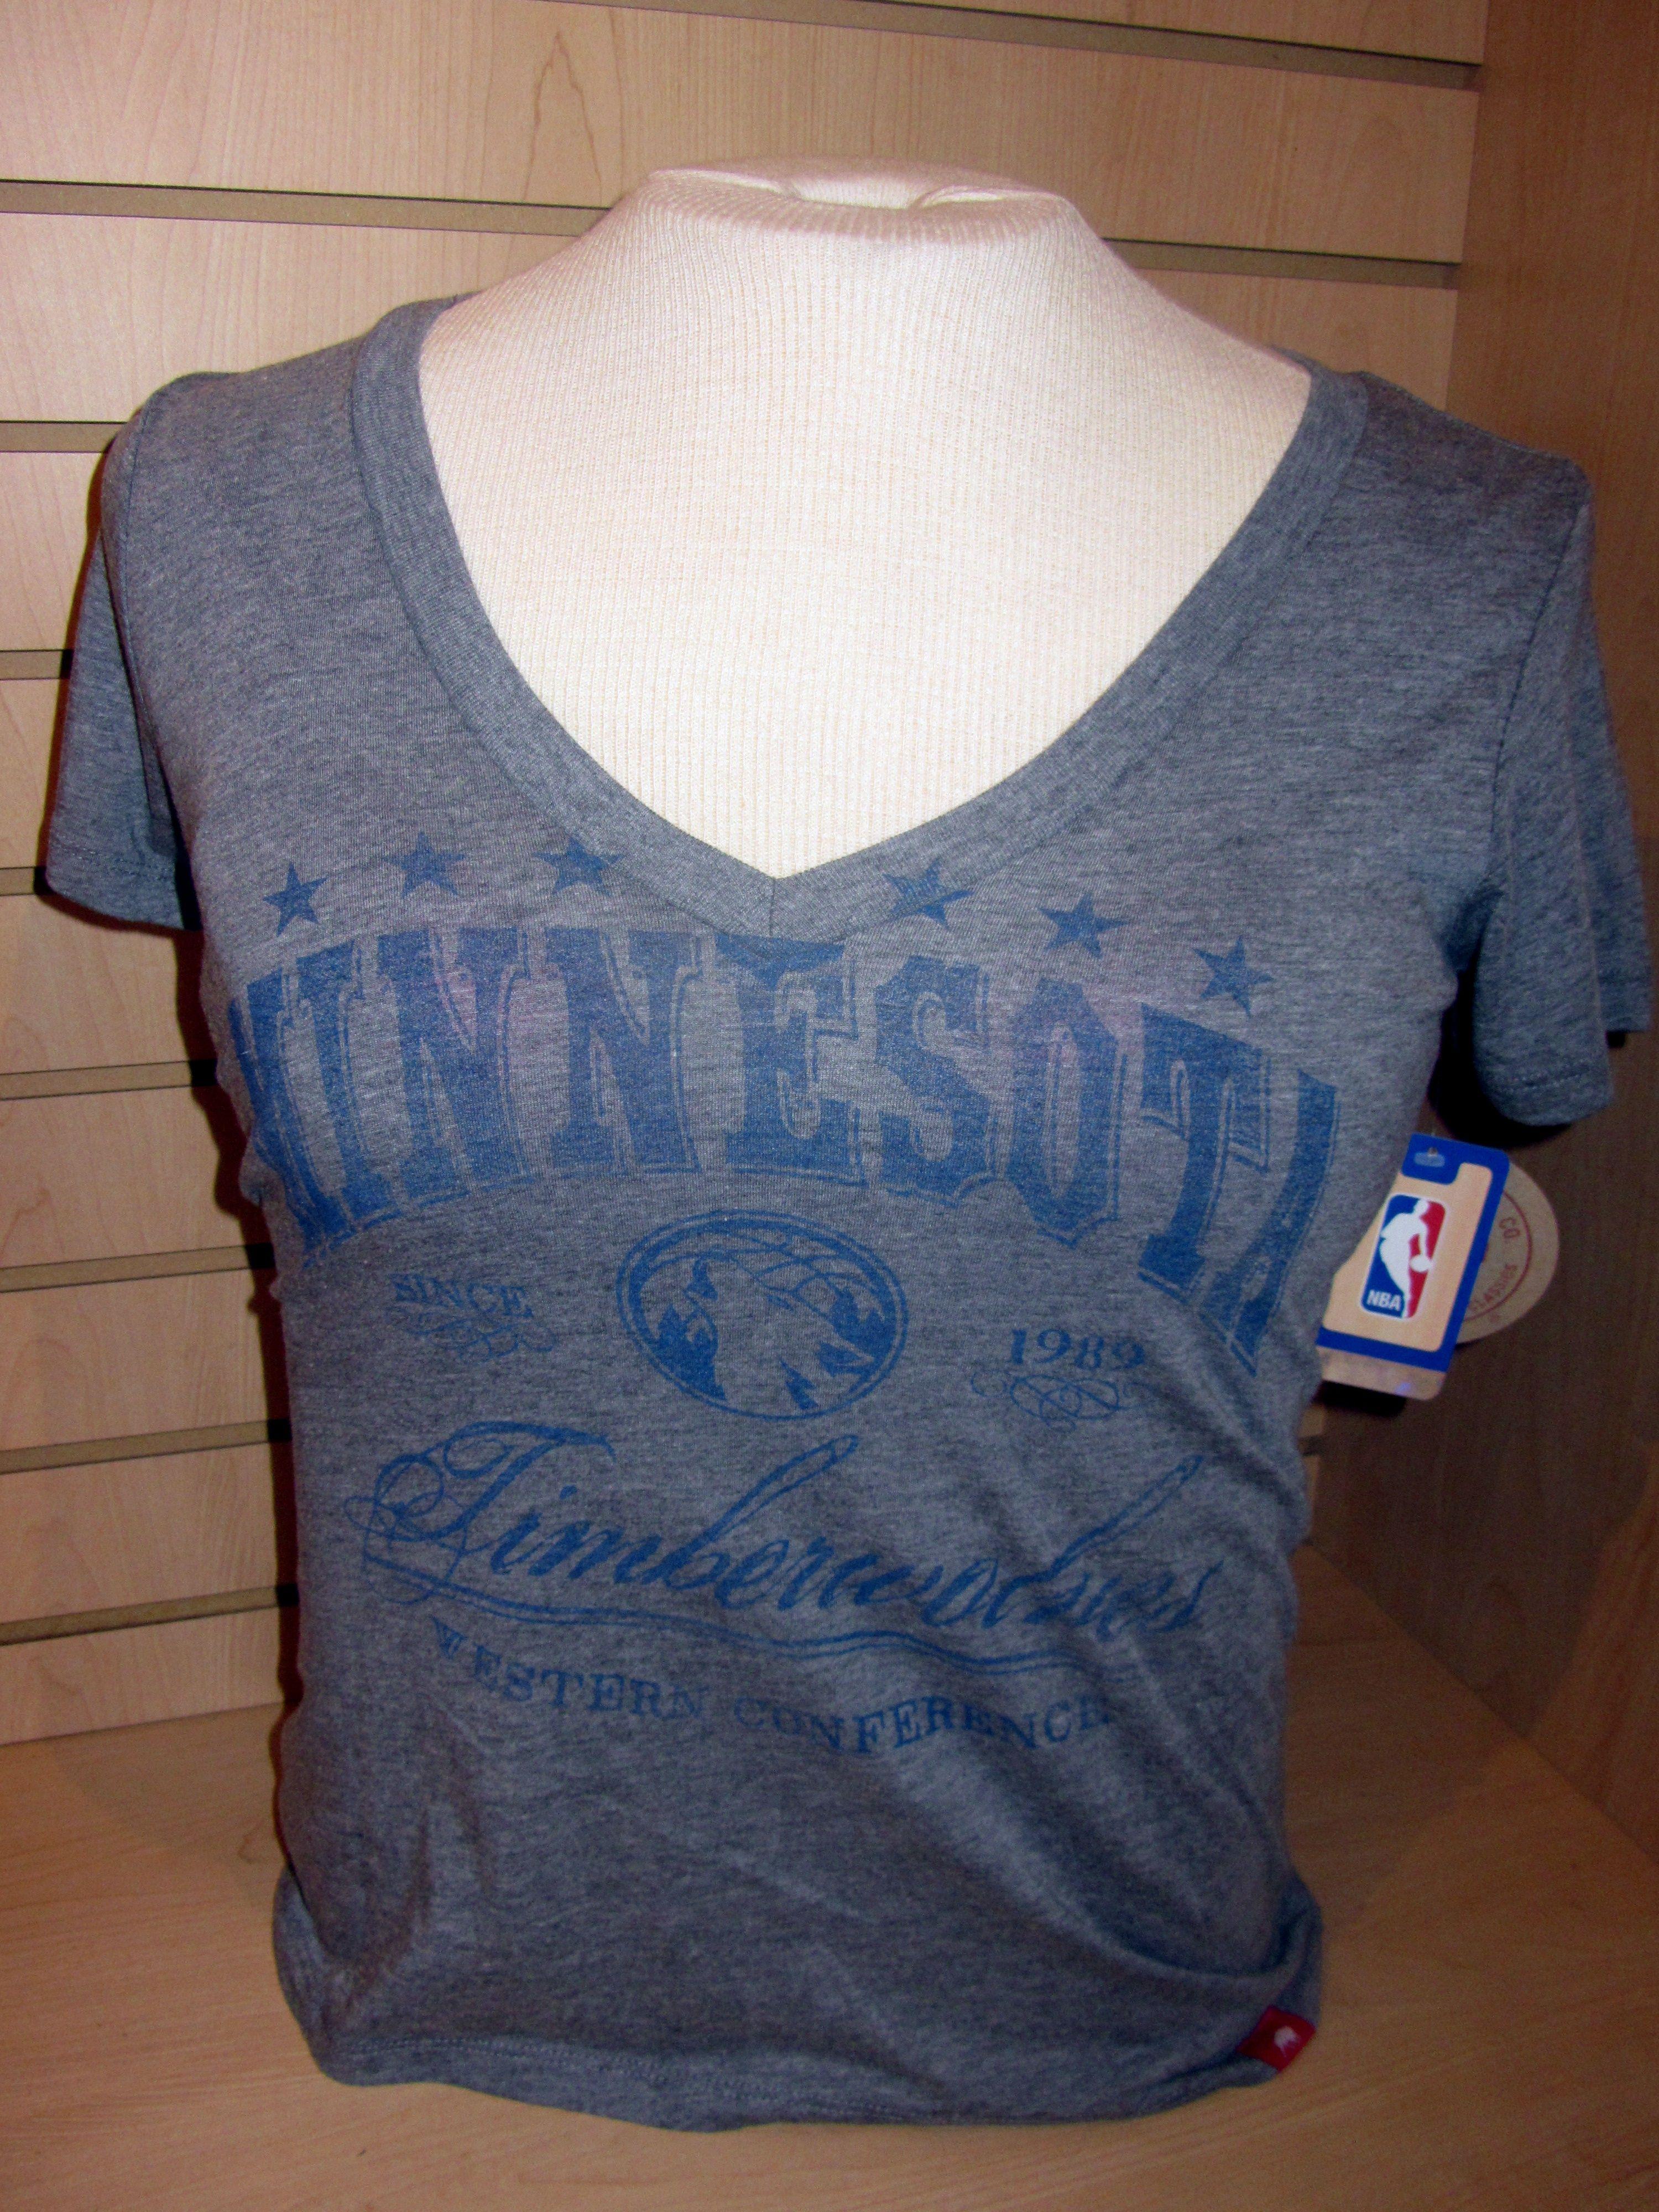 75ca79f5 Women's Minnesota Timberwolves V-neck... $25 | Apparel | Pinterest ...